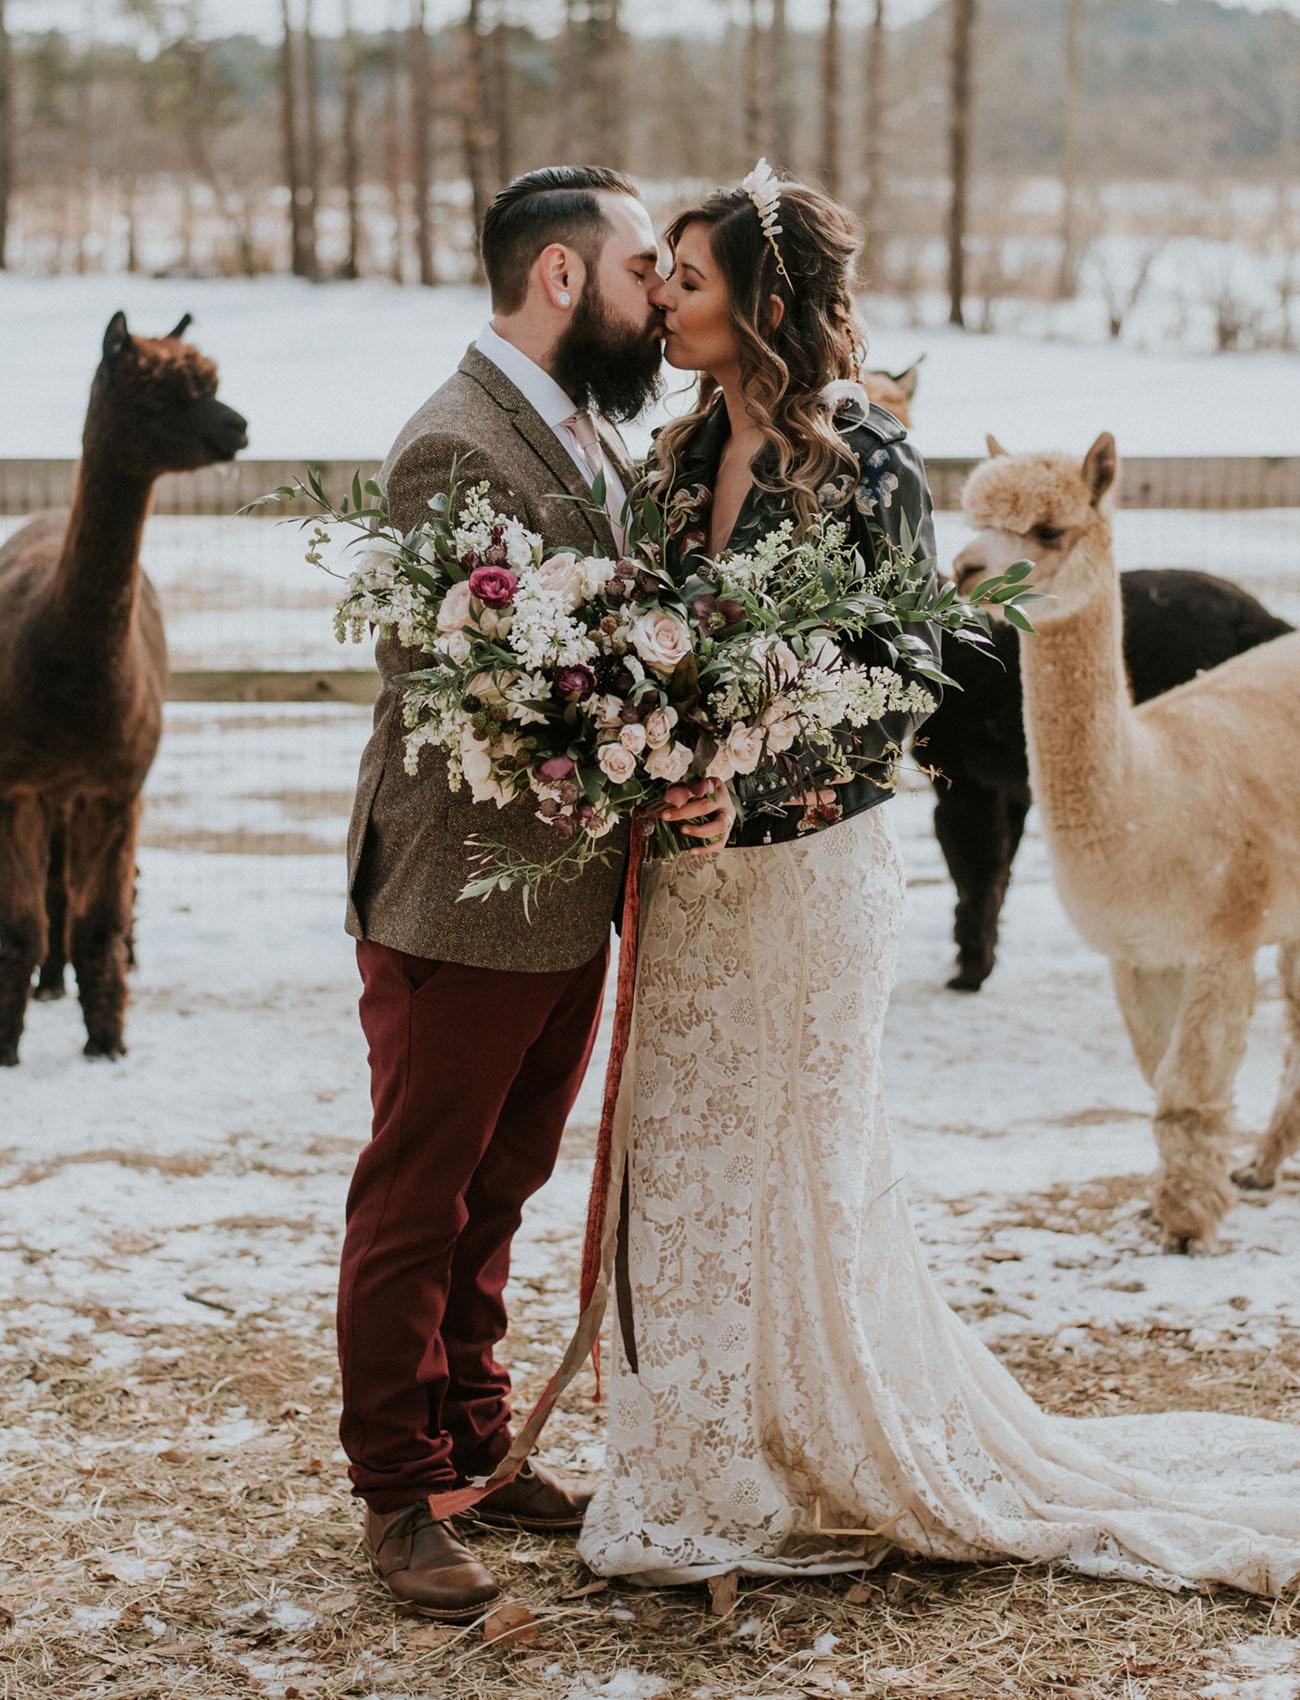 The groom was wearing a tweed blazer, a blush tie, burgundy pants, brown shoes